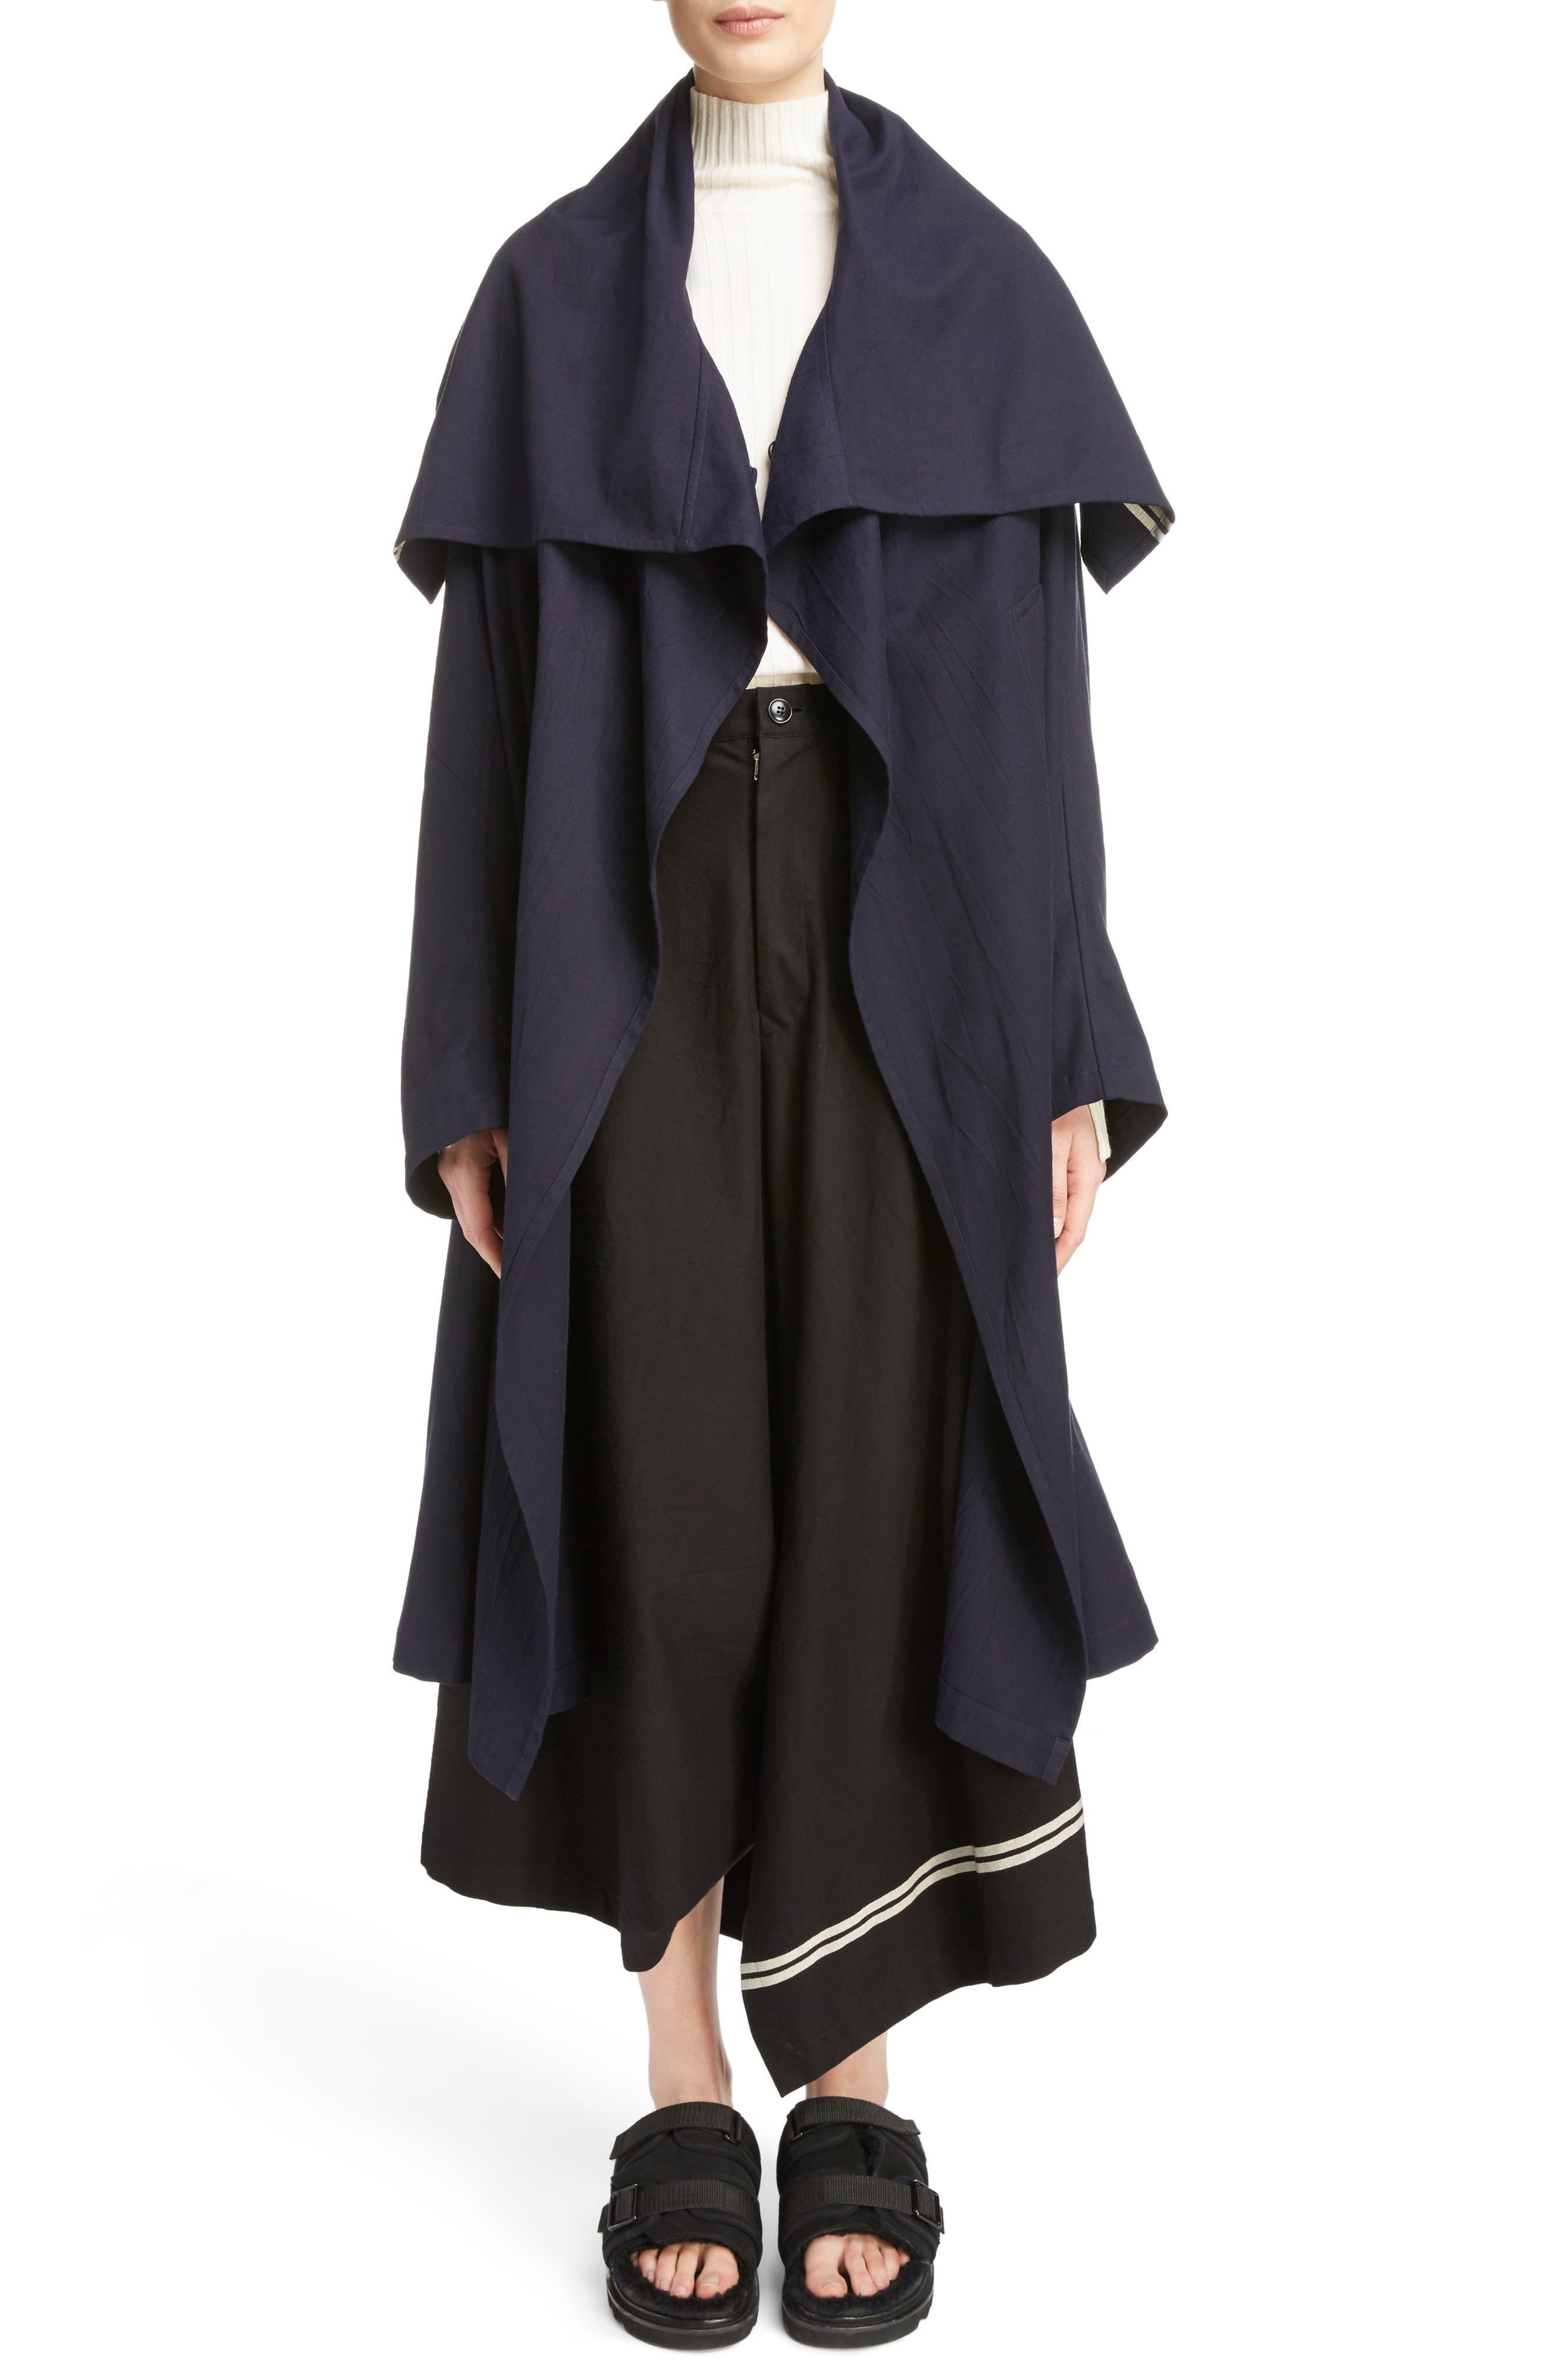 Y's by Yohji Yamamoto Drape Collar Coat